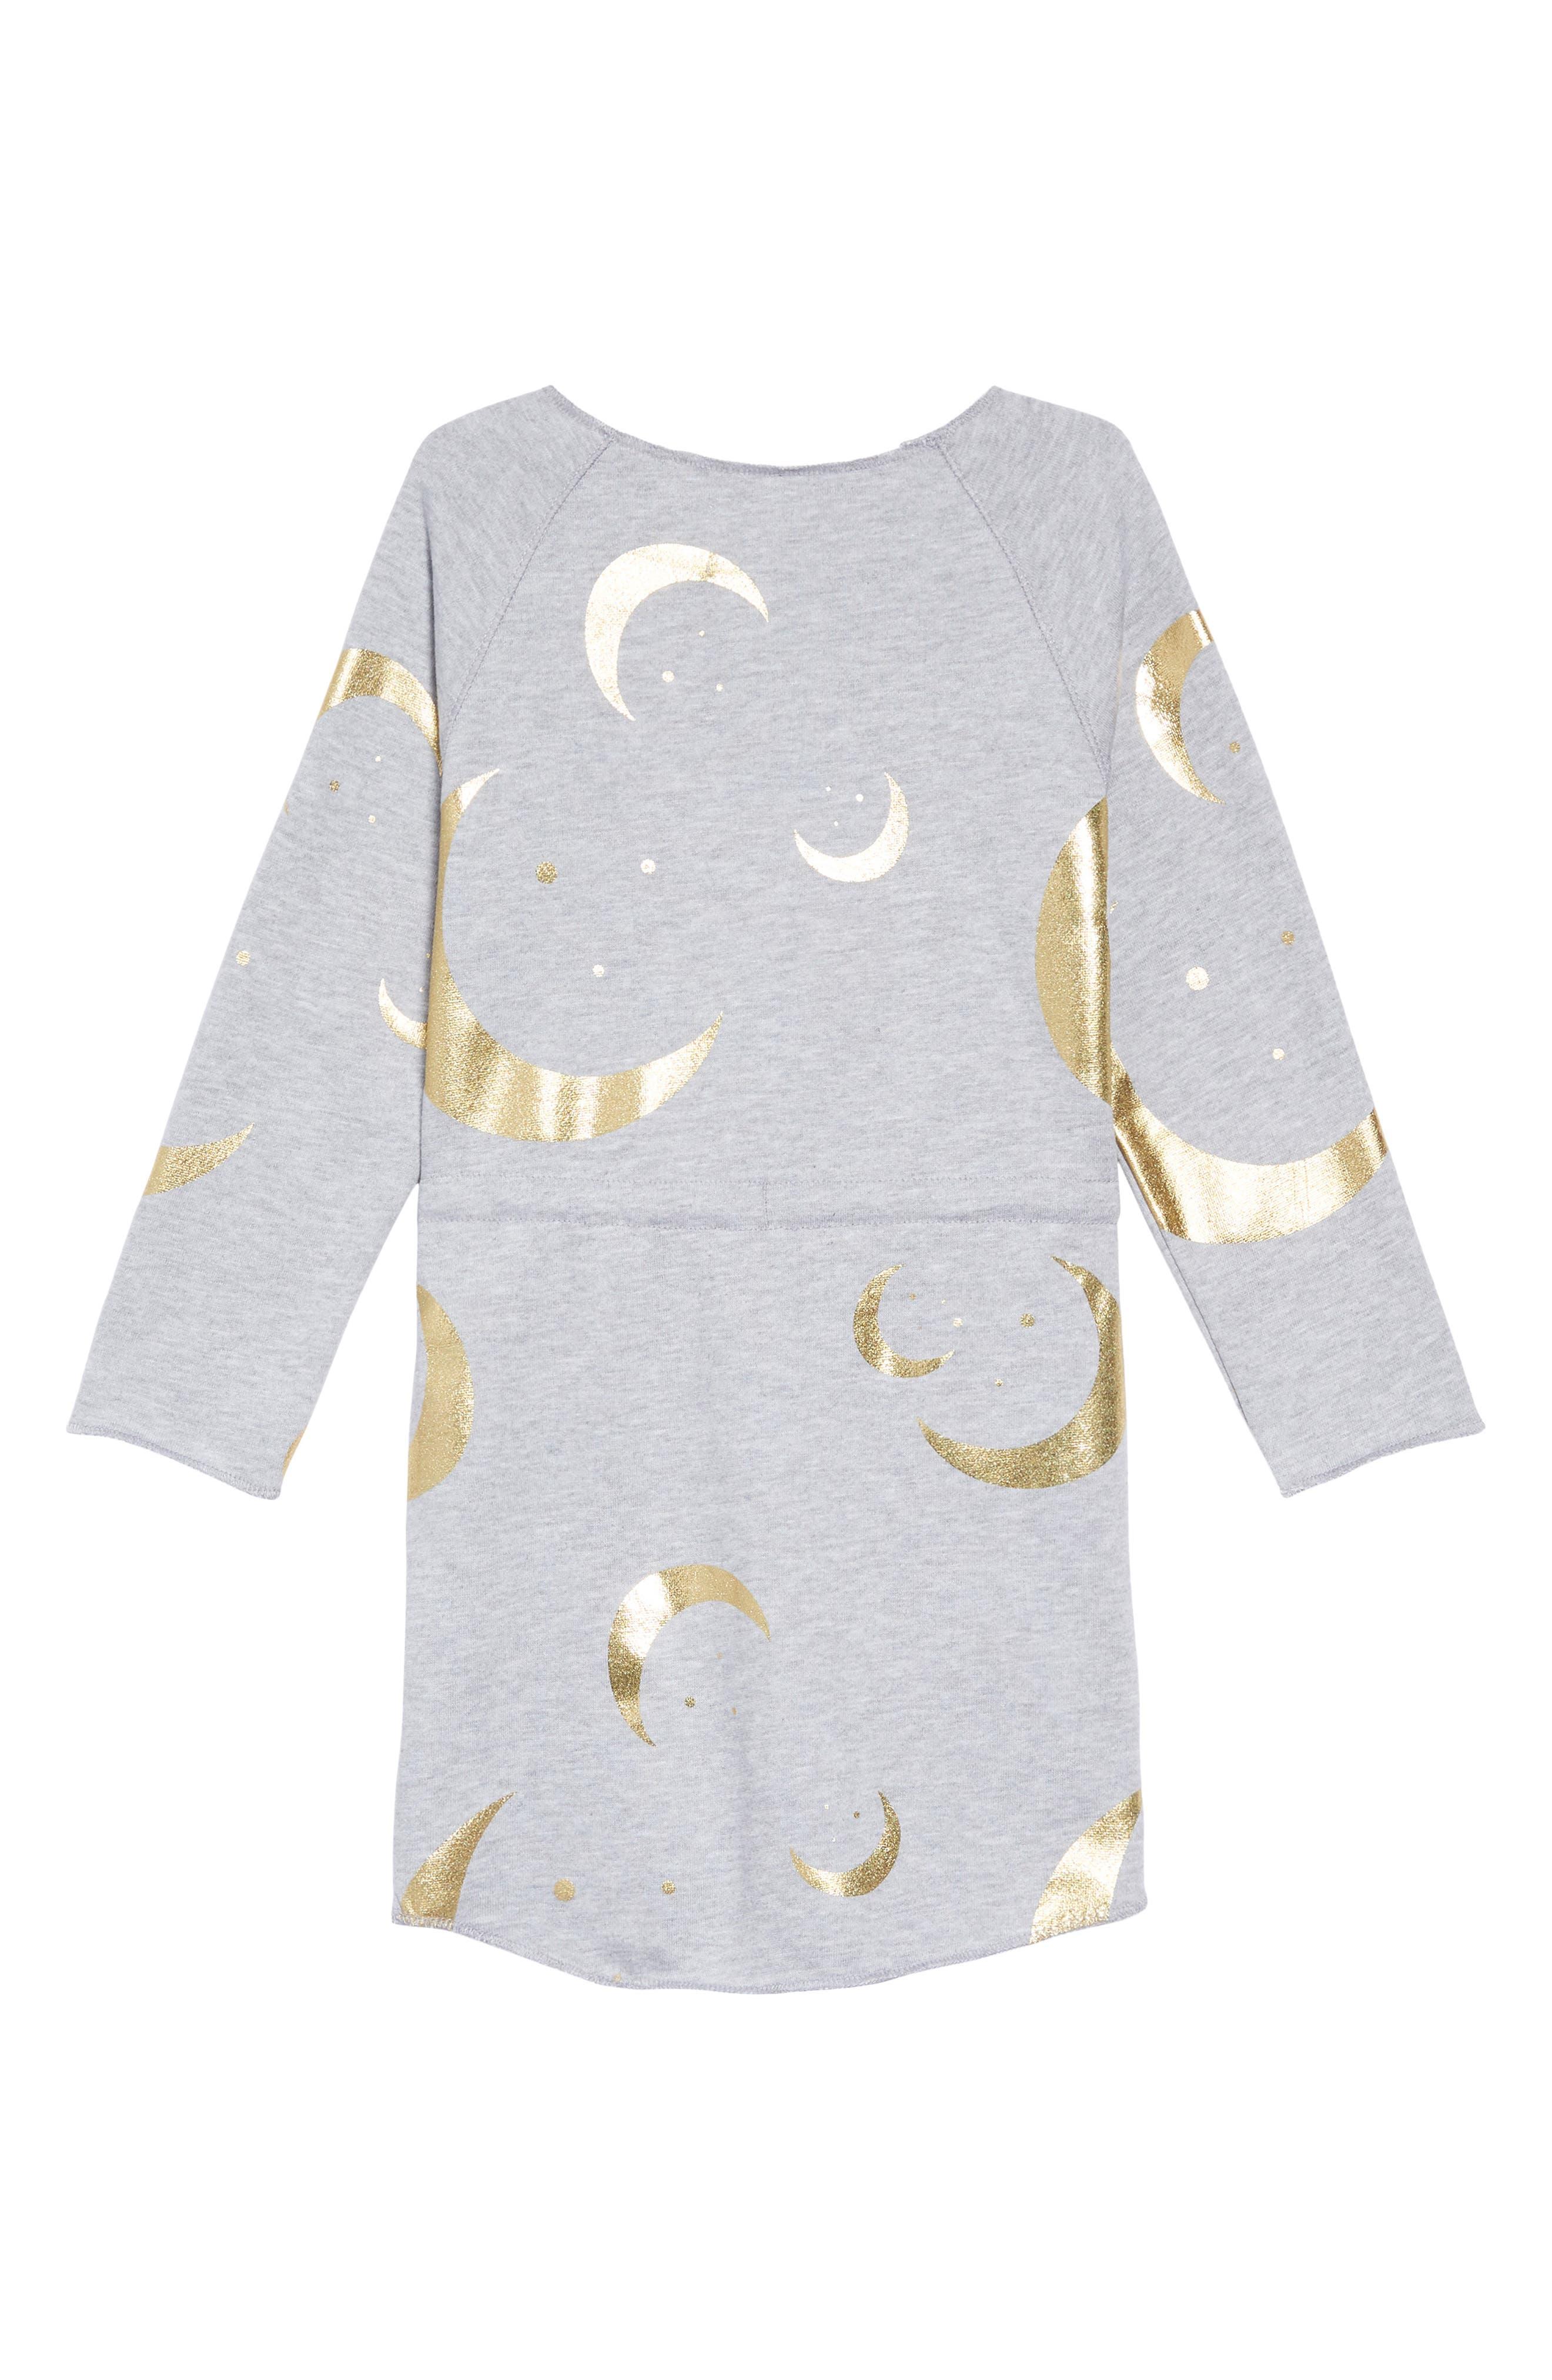 Danica Print Sweatshirt Dress,                             Alternate thumbnail 2, color,                             HALF MOON/HEATHER GREY